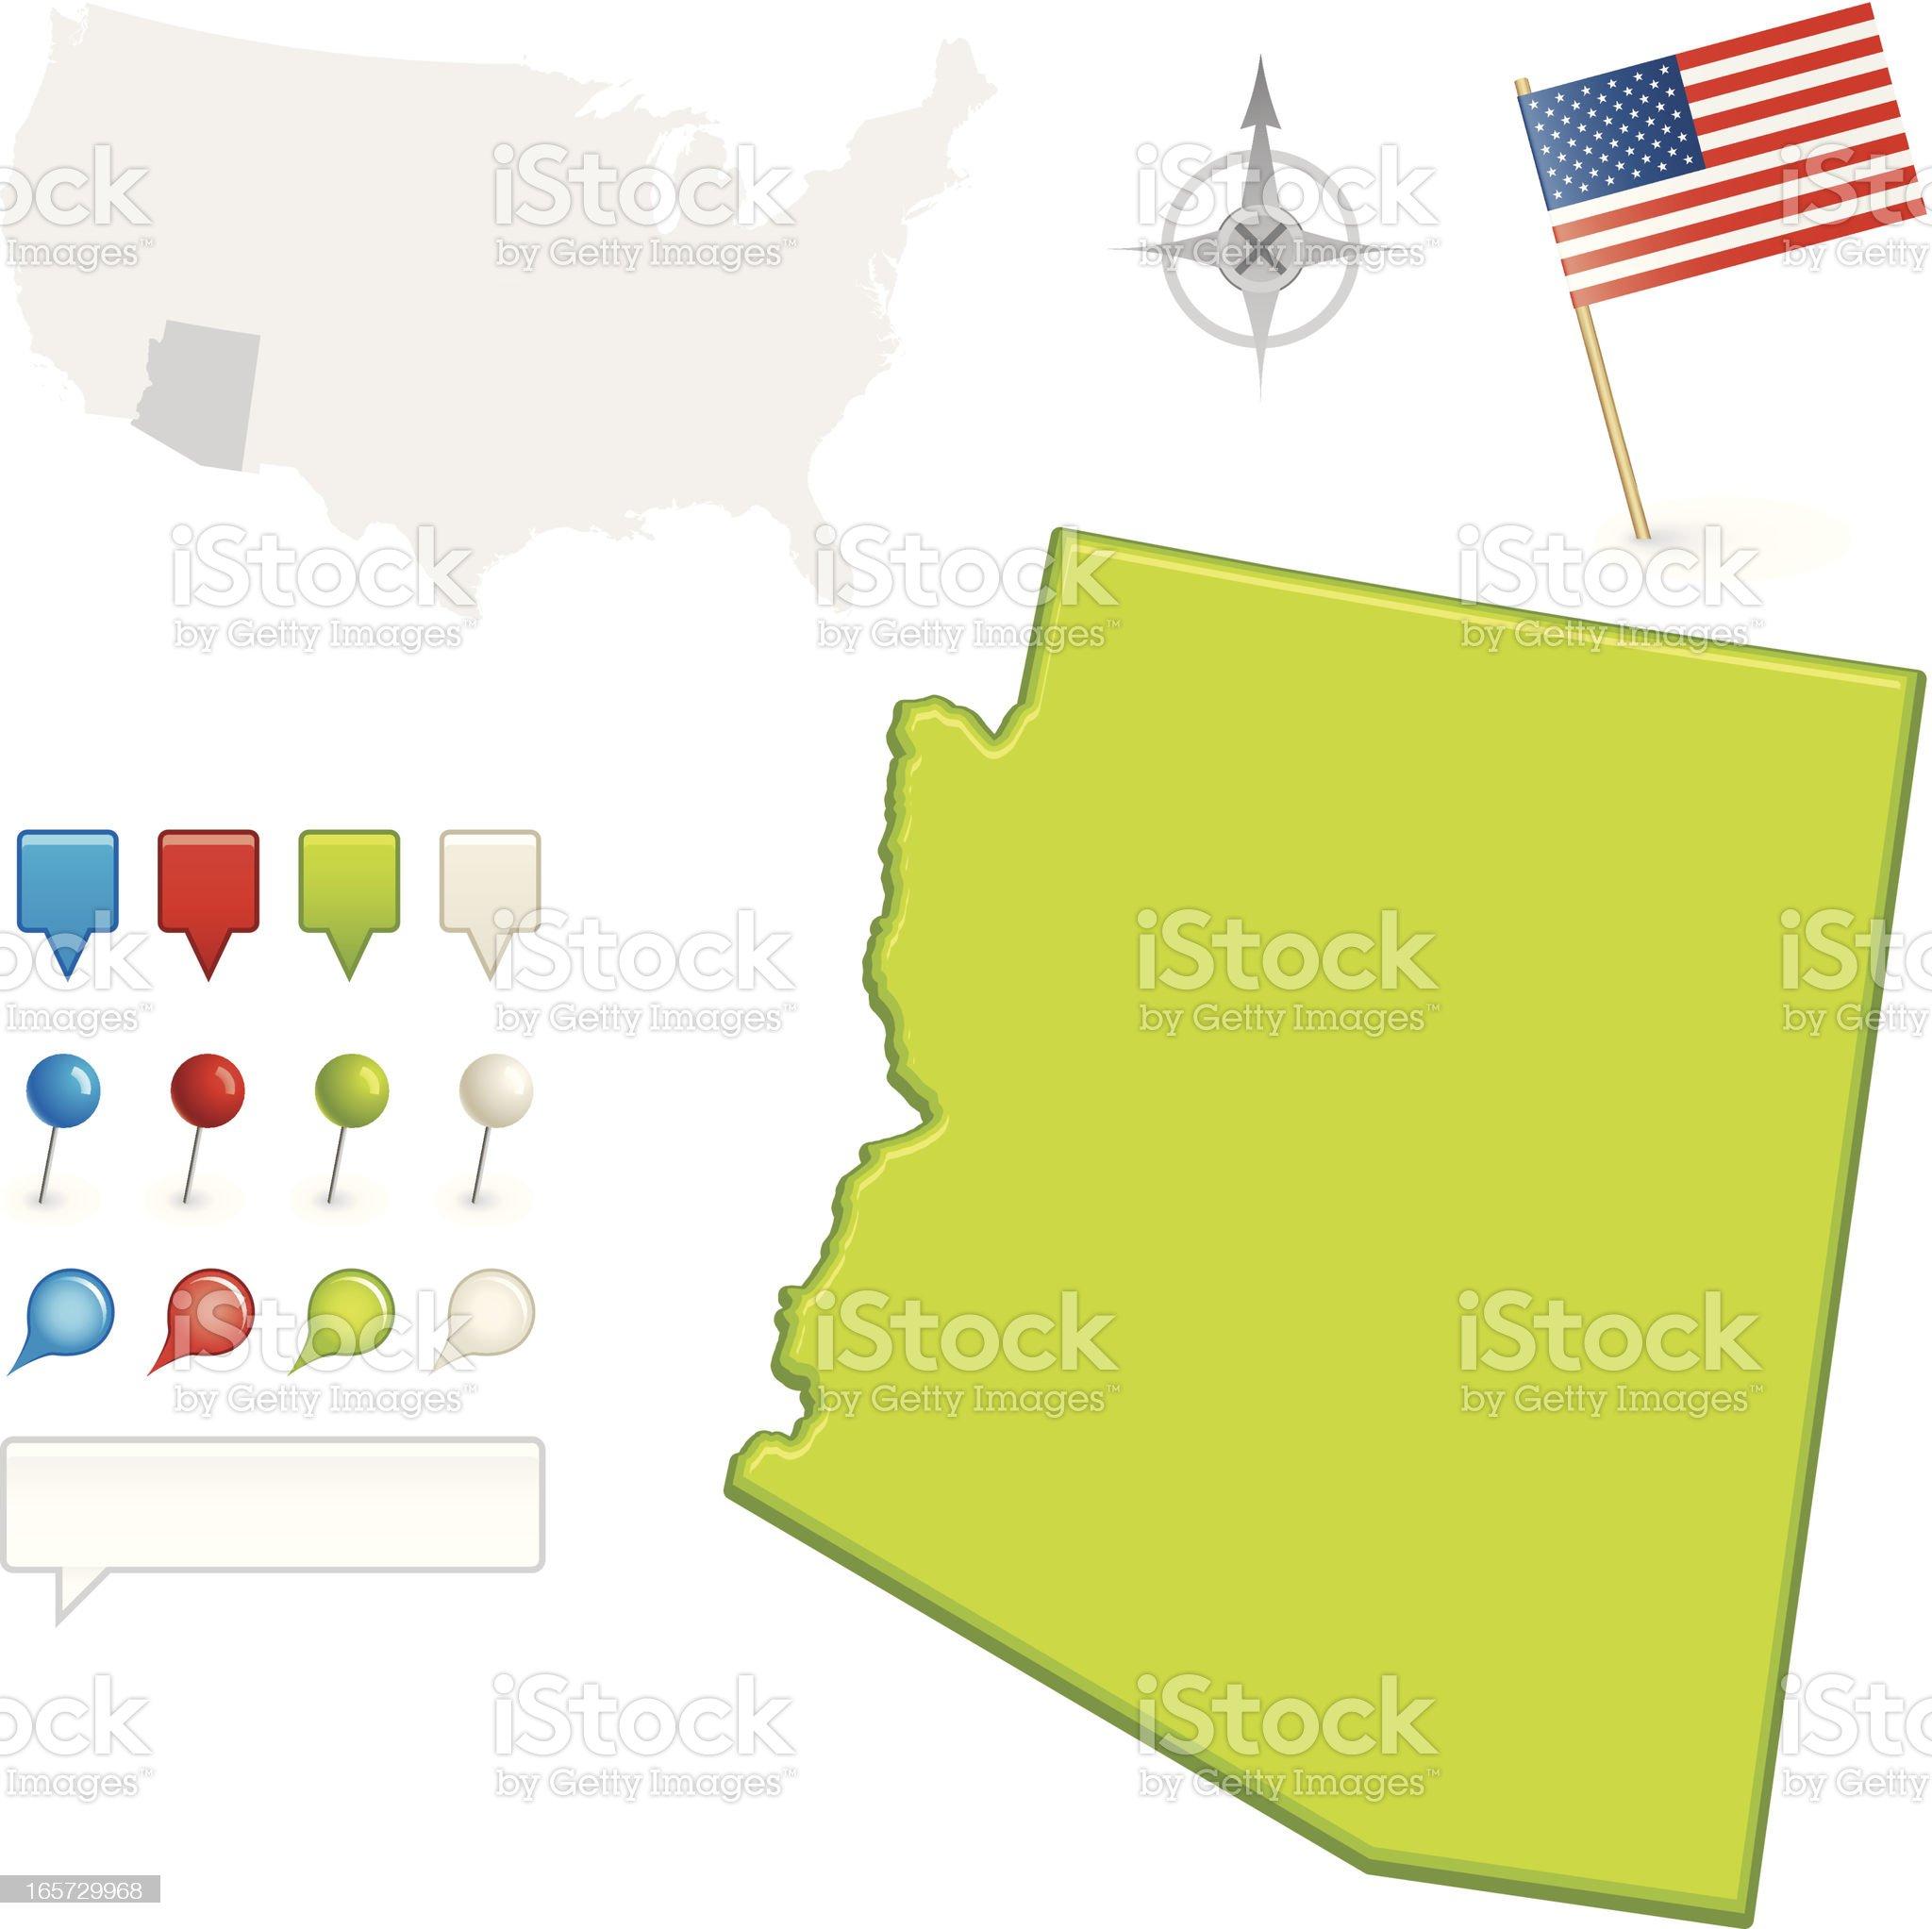 Arizona State Map royalty-free stock vector art